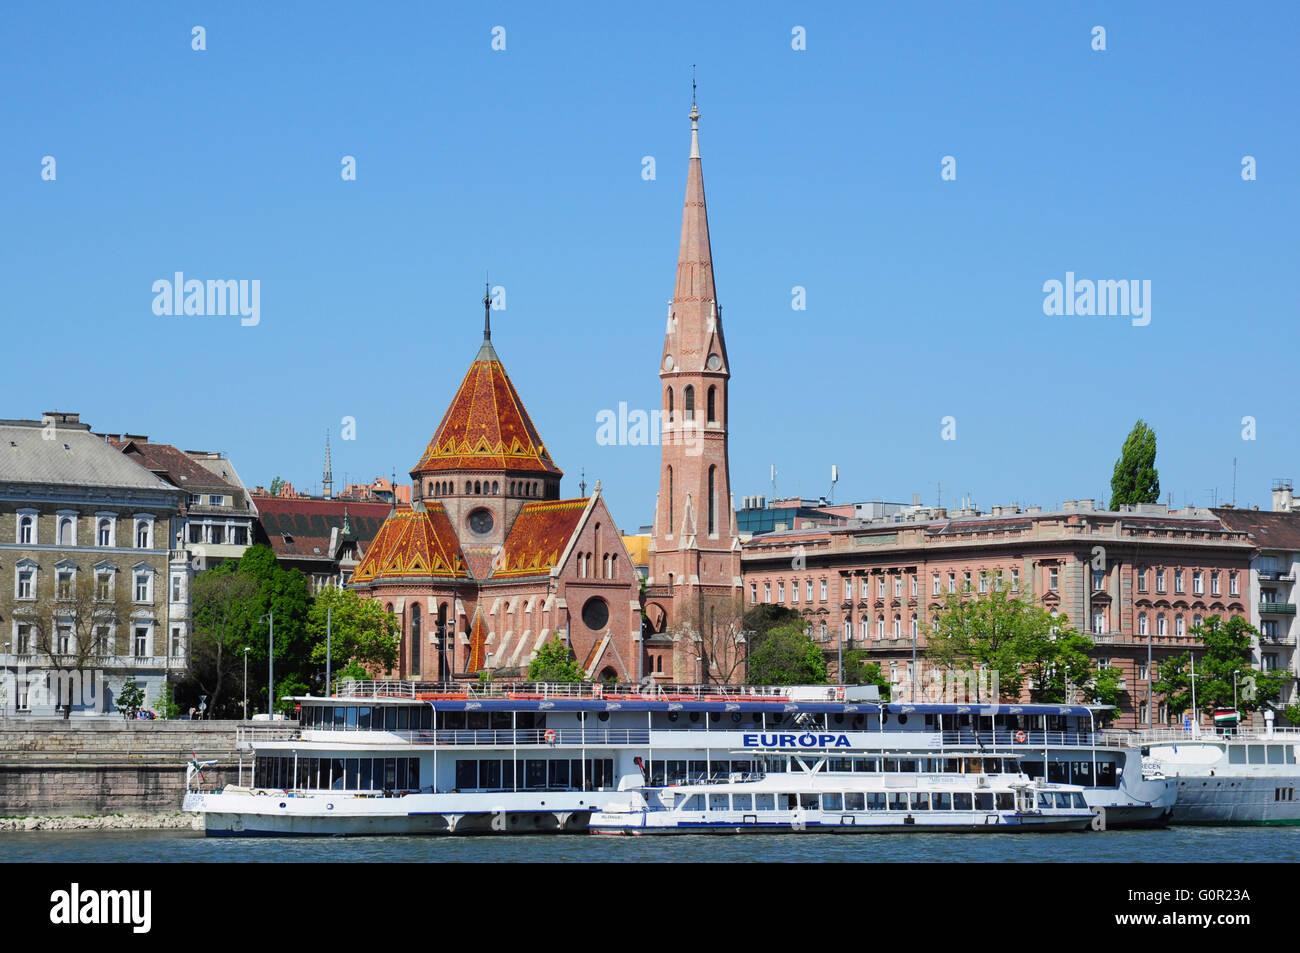 River Danube cruise ship and Buda Calvinist Church, Budapest, Hungary Stock Photo